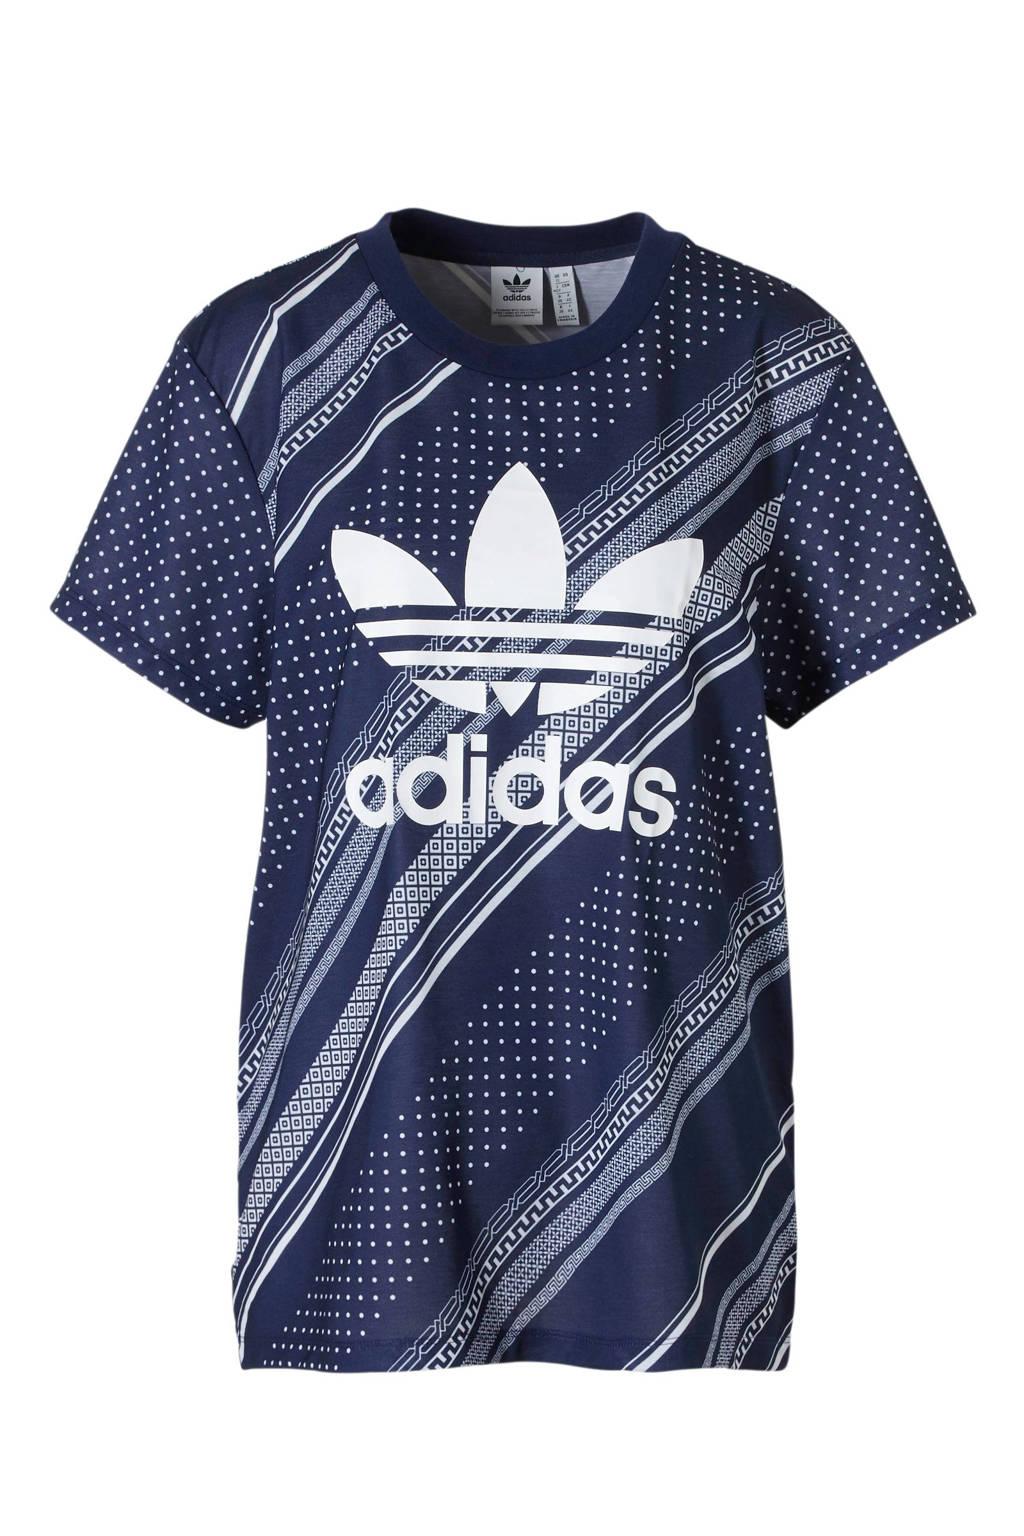 adidas originals T-shirt all over print blauw, Blauw/wit